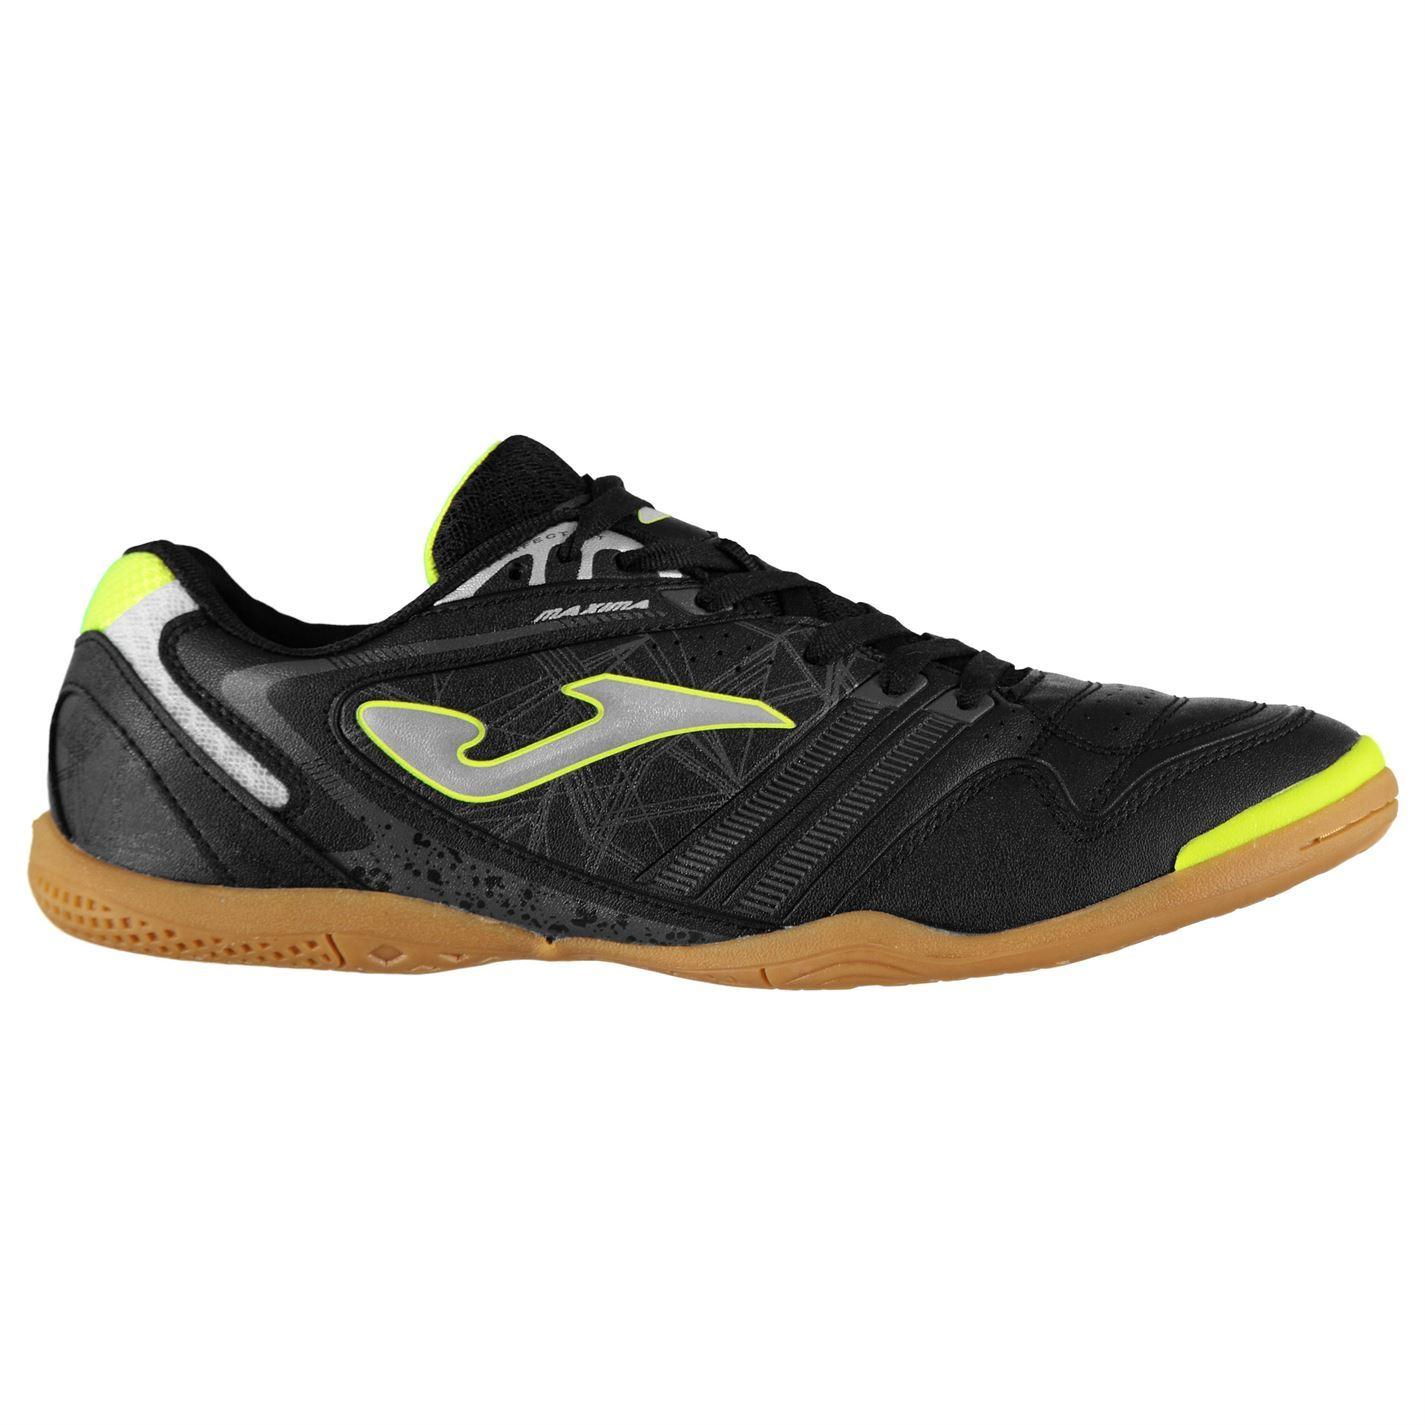 c394768617c Joma Maxima Indoor Football Trainers Mens Soccer Futsal Shoes ...